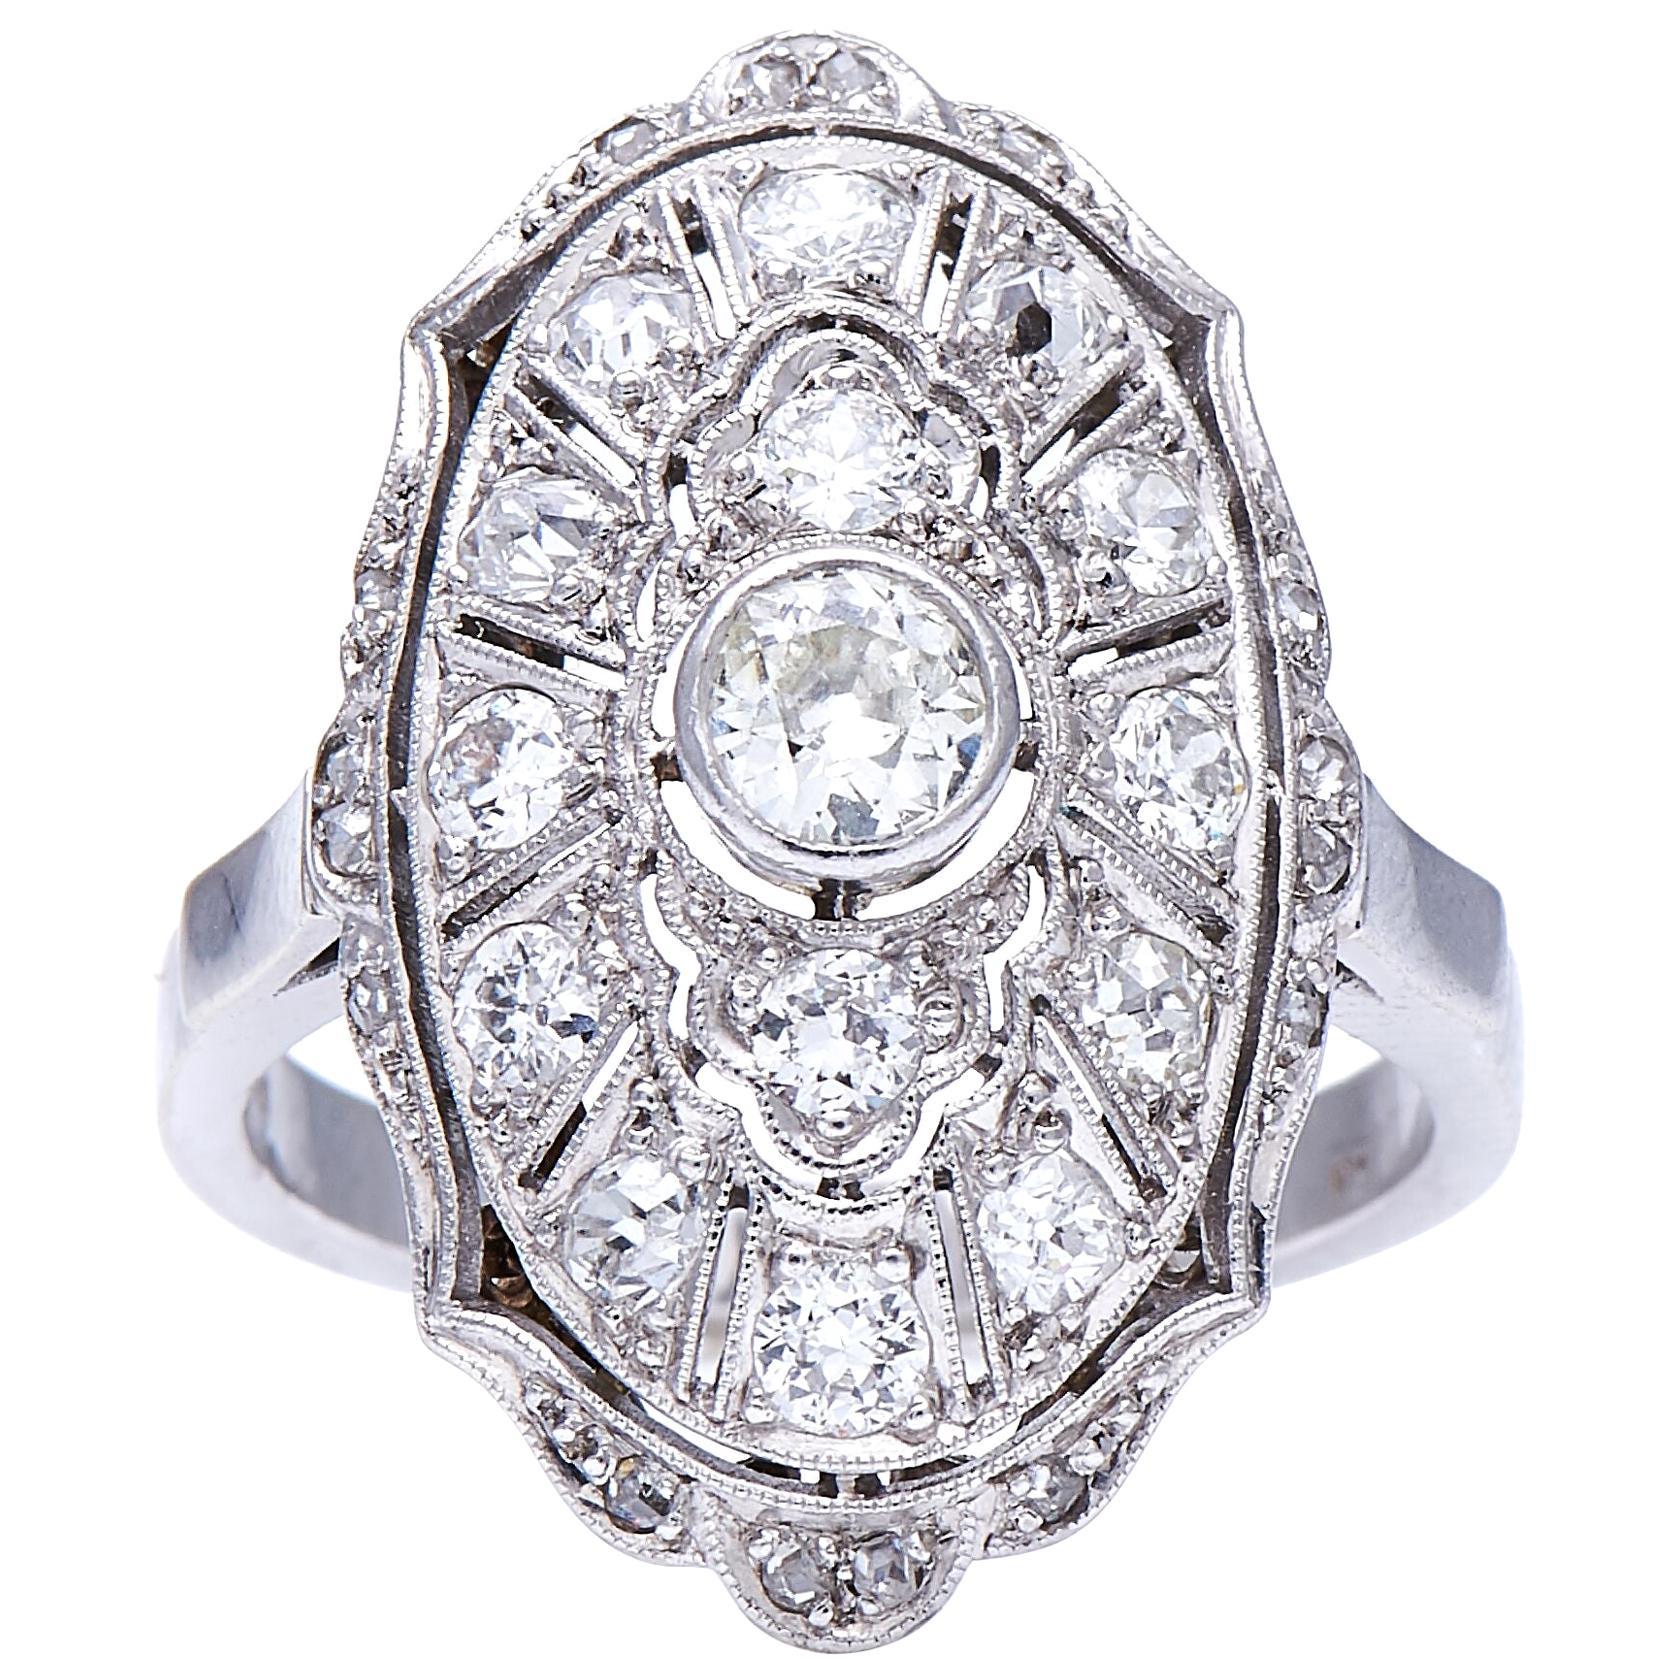 Antique, Edwardian, 18 Carat White Gold, Platinum, Old Cut Diamond Plaque Ring